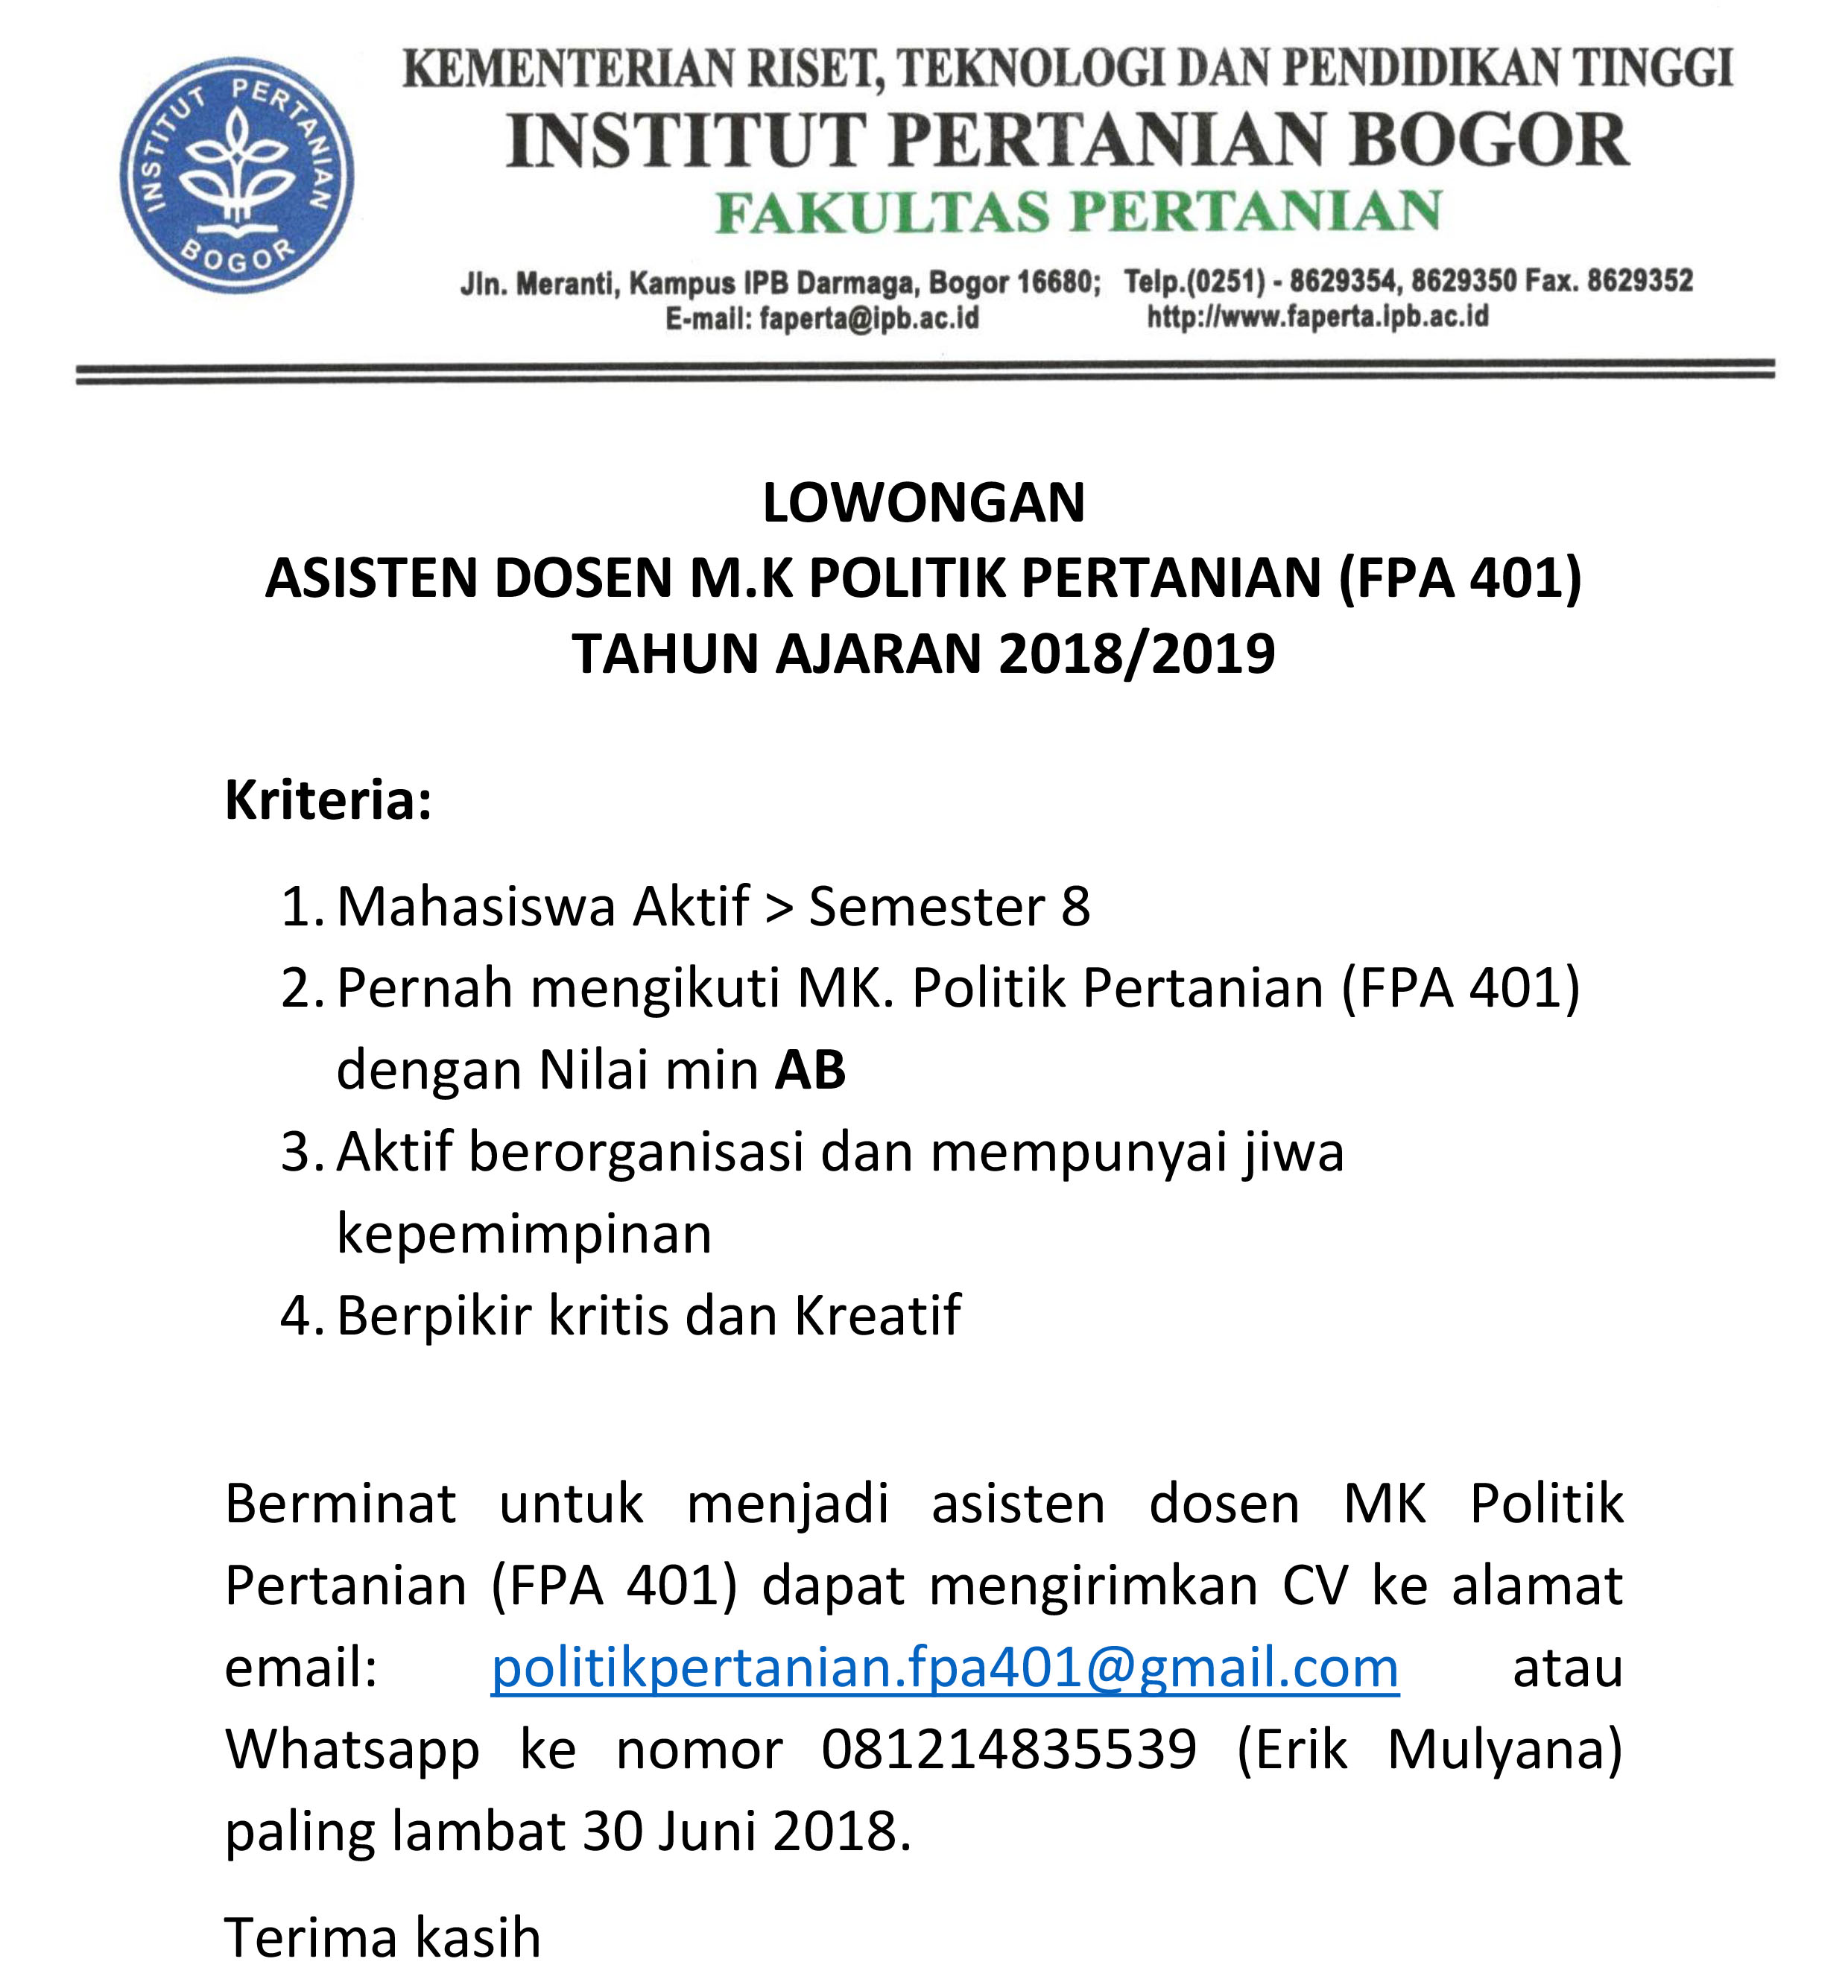 Lowongan Asisten Dosen M K Politik Pertanian Fpa 401 Tahun Ajaran 2018 2019 Faperta Ipb